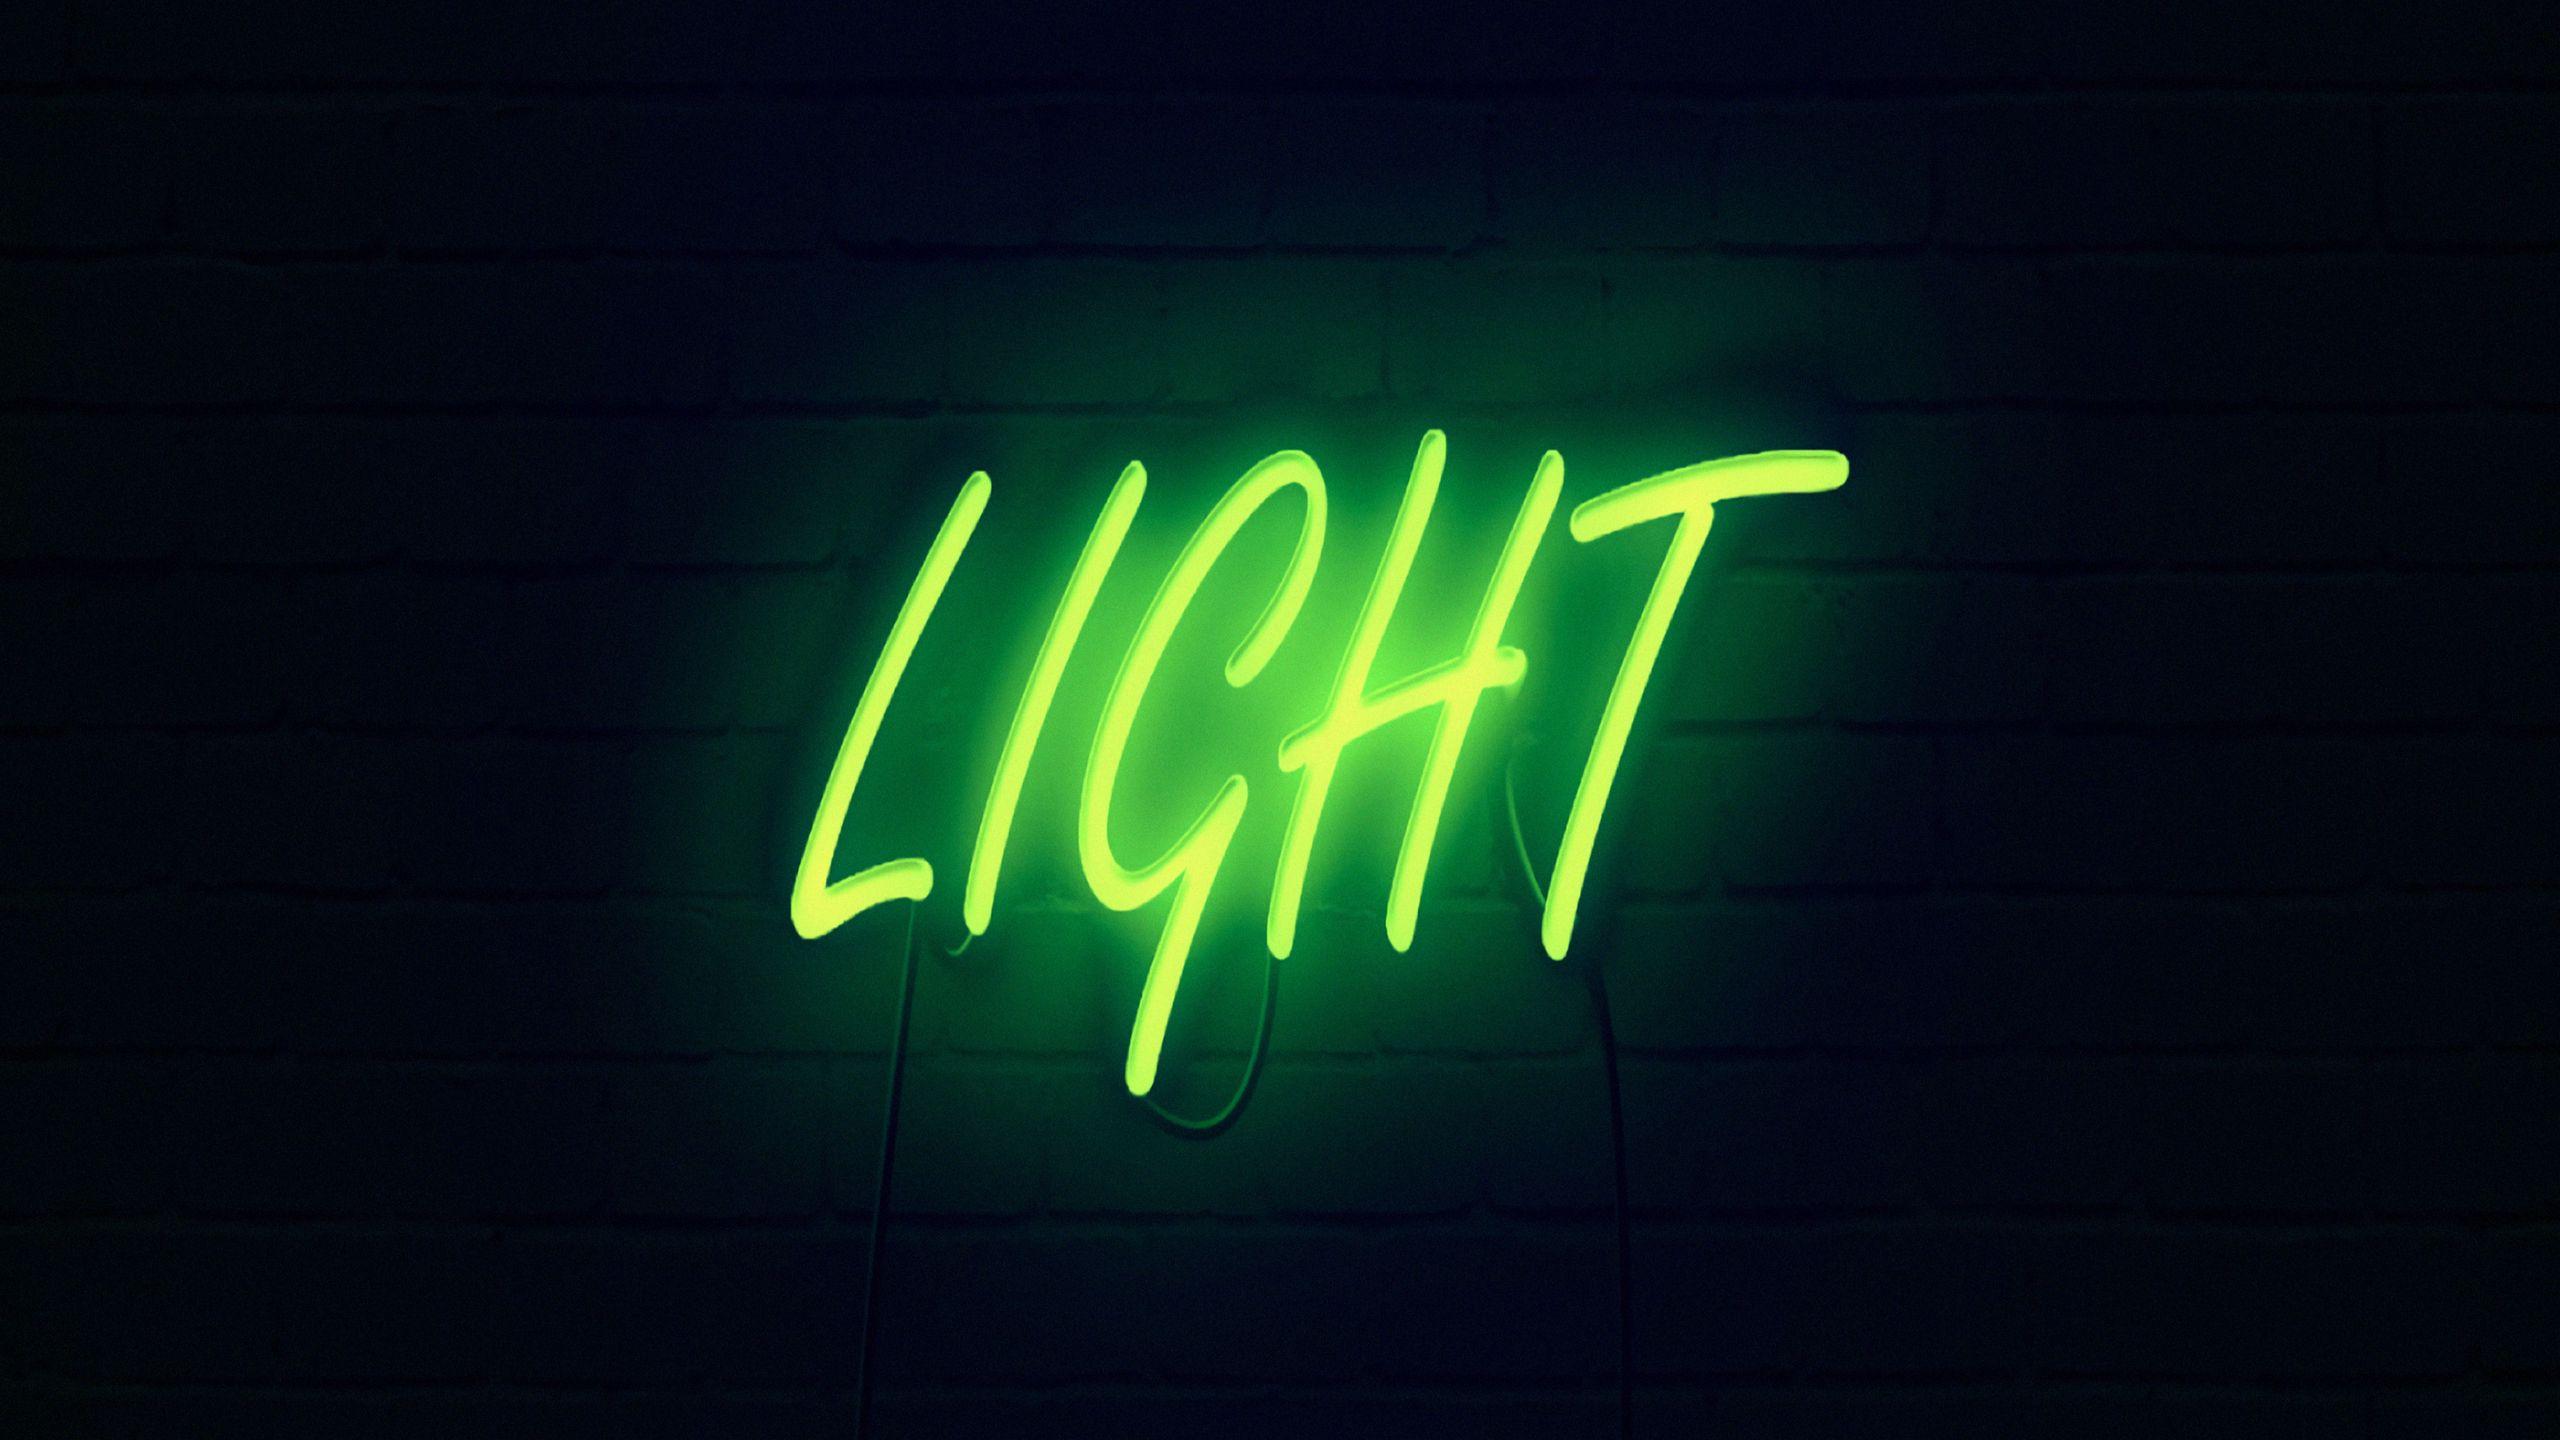 2560x1440 Wallpaper light, neon, inscription, dark, yellow